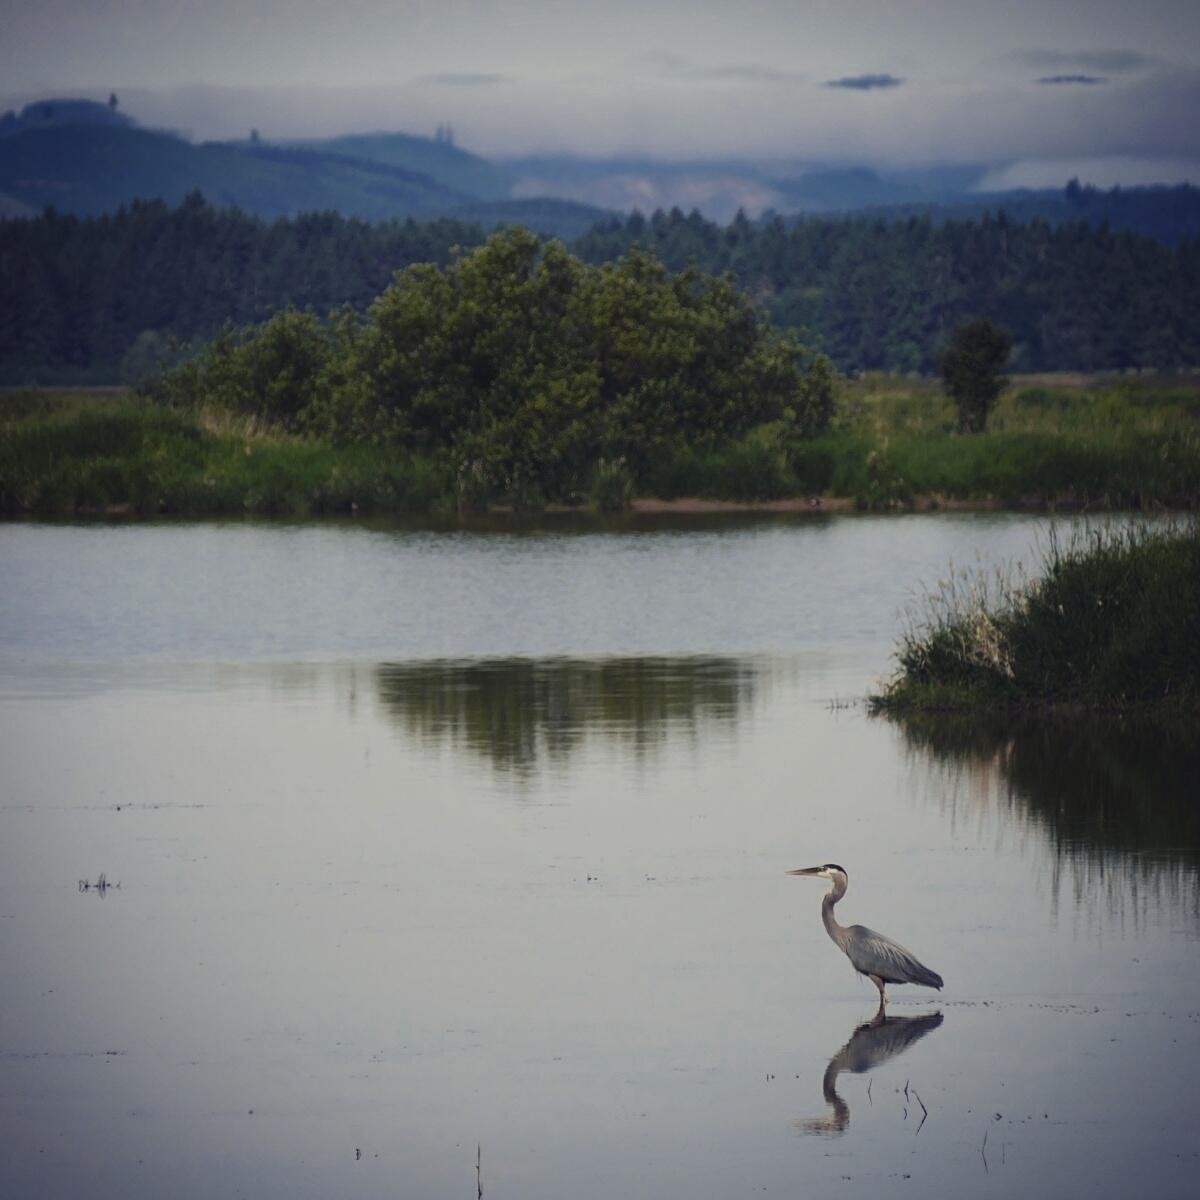 A Great Blue Heron pauses at Fern Ridge Reservoir. Noah Strycker